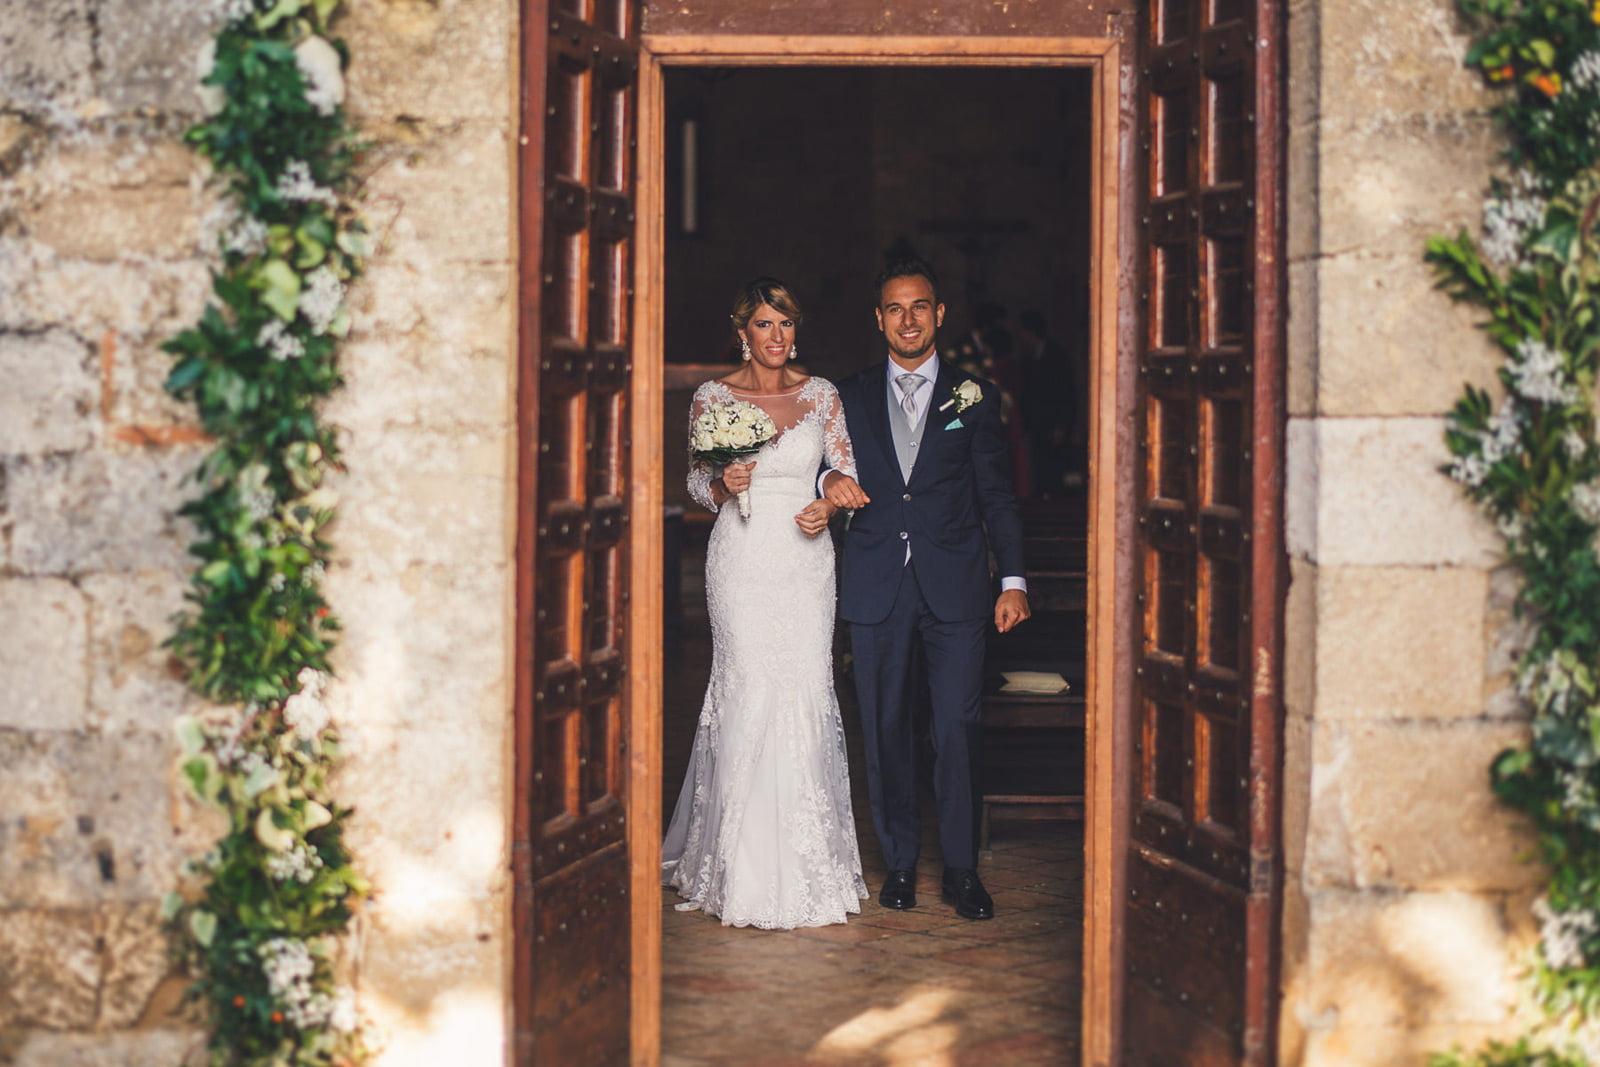 054-wedding-florence-palazzo-borghese